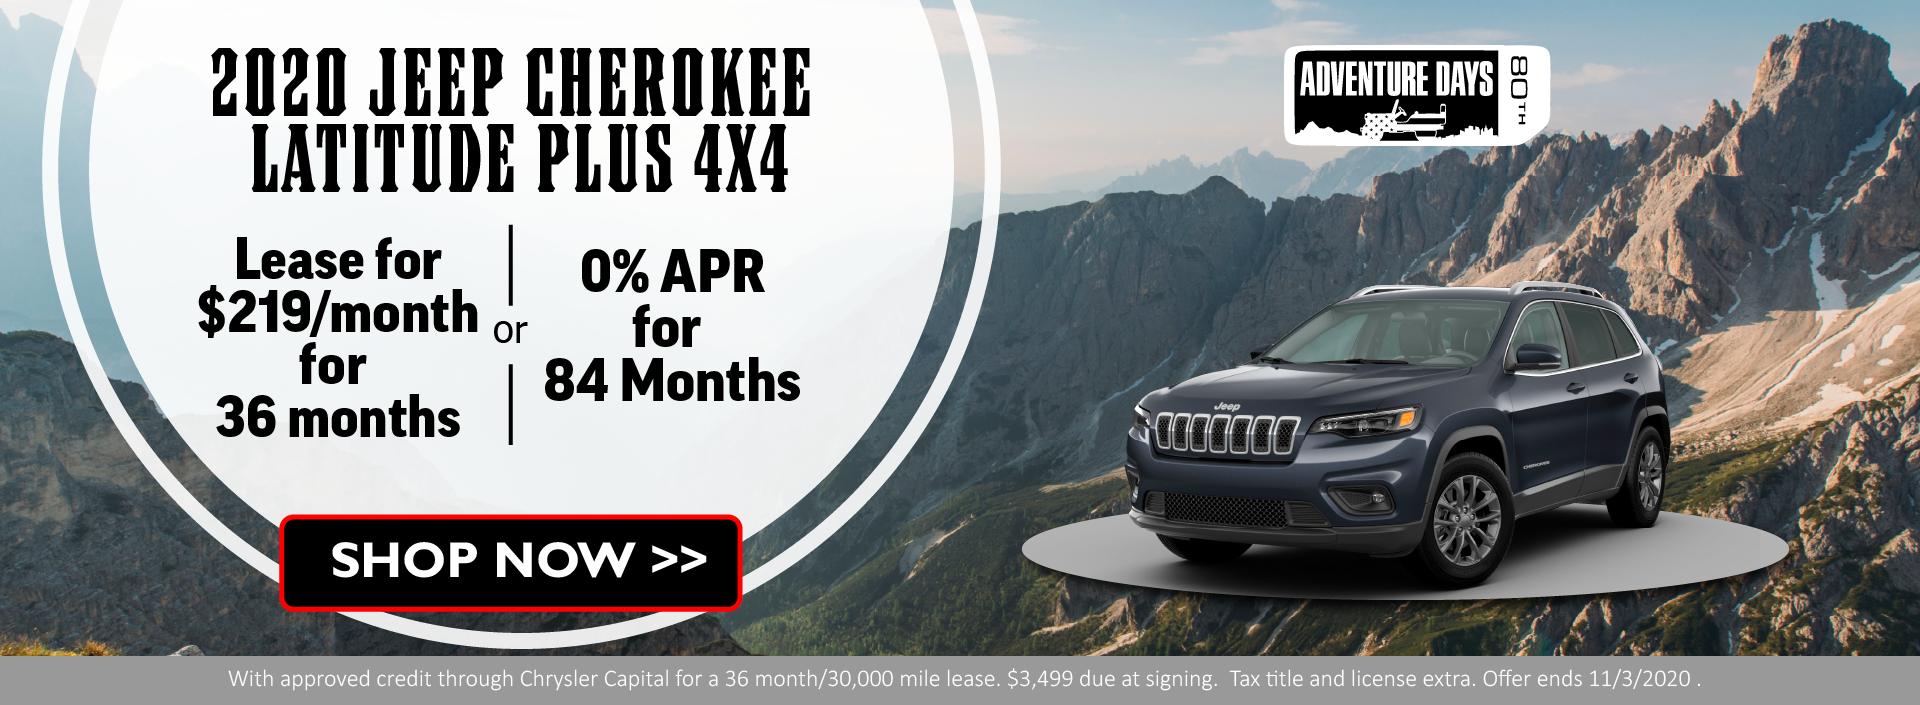 2020 Jeep Cherokee October FIXED